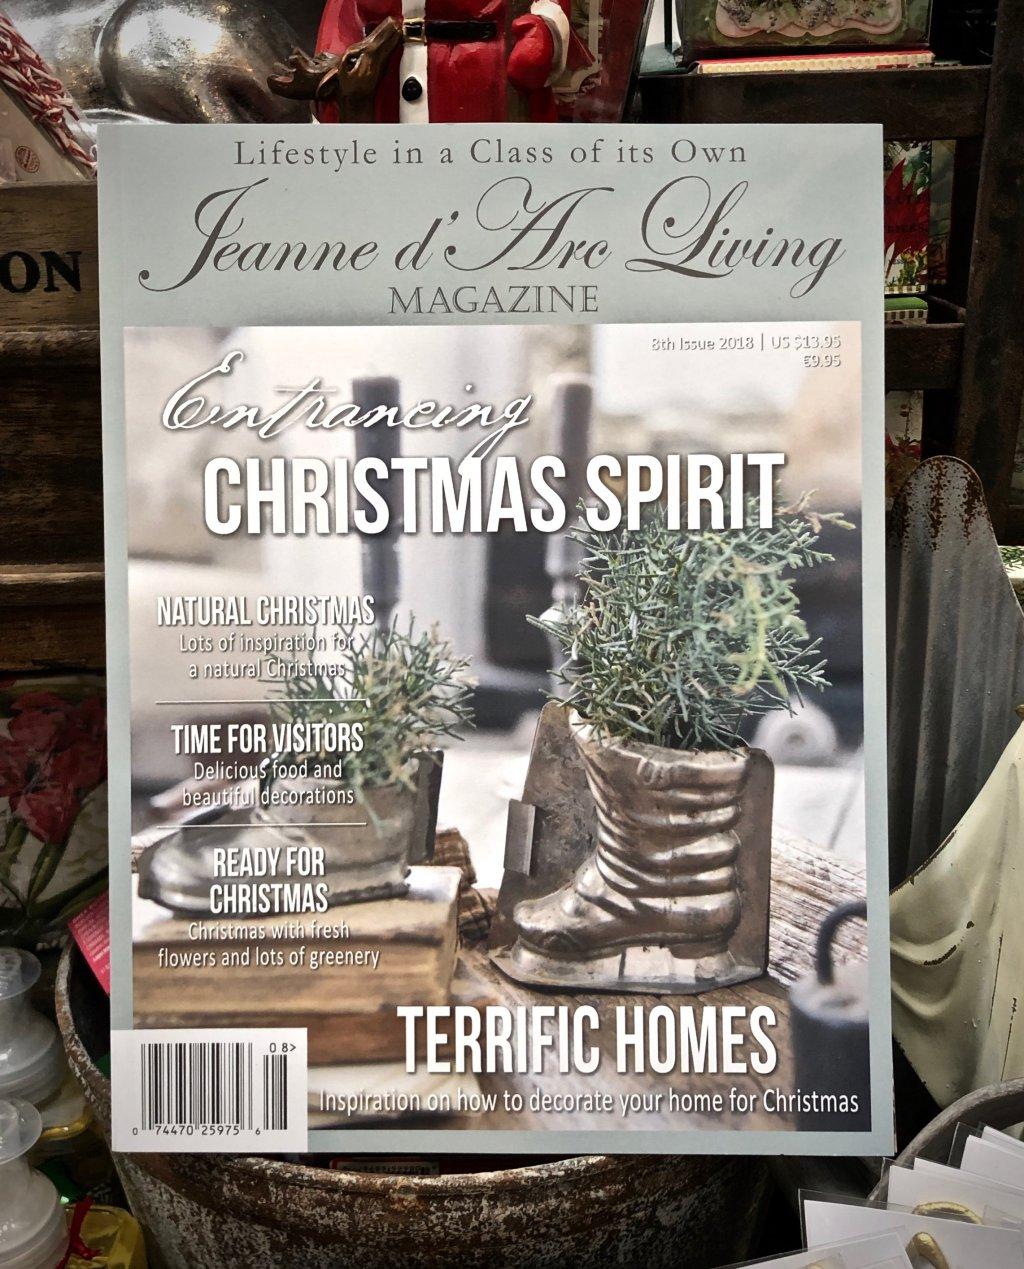 Jeanne d'Arc Living Magazine | Issue 8 | Christmas 2018